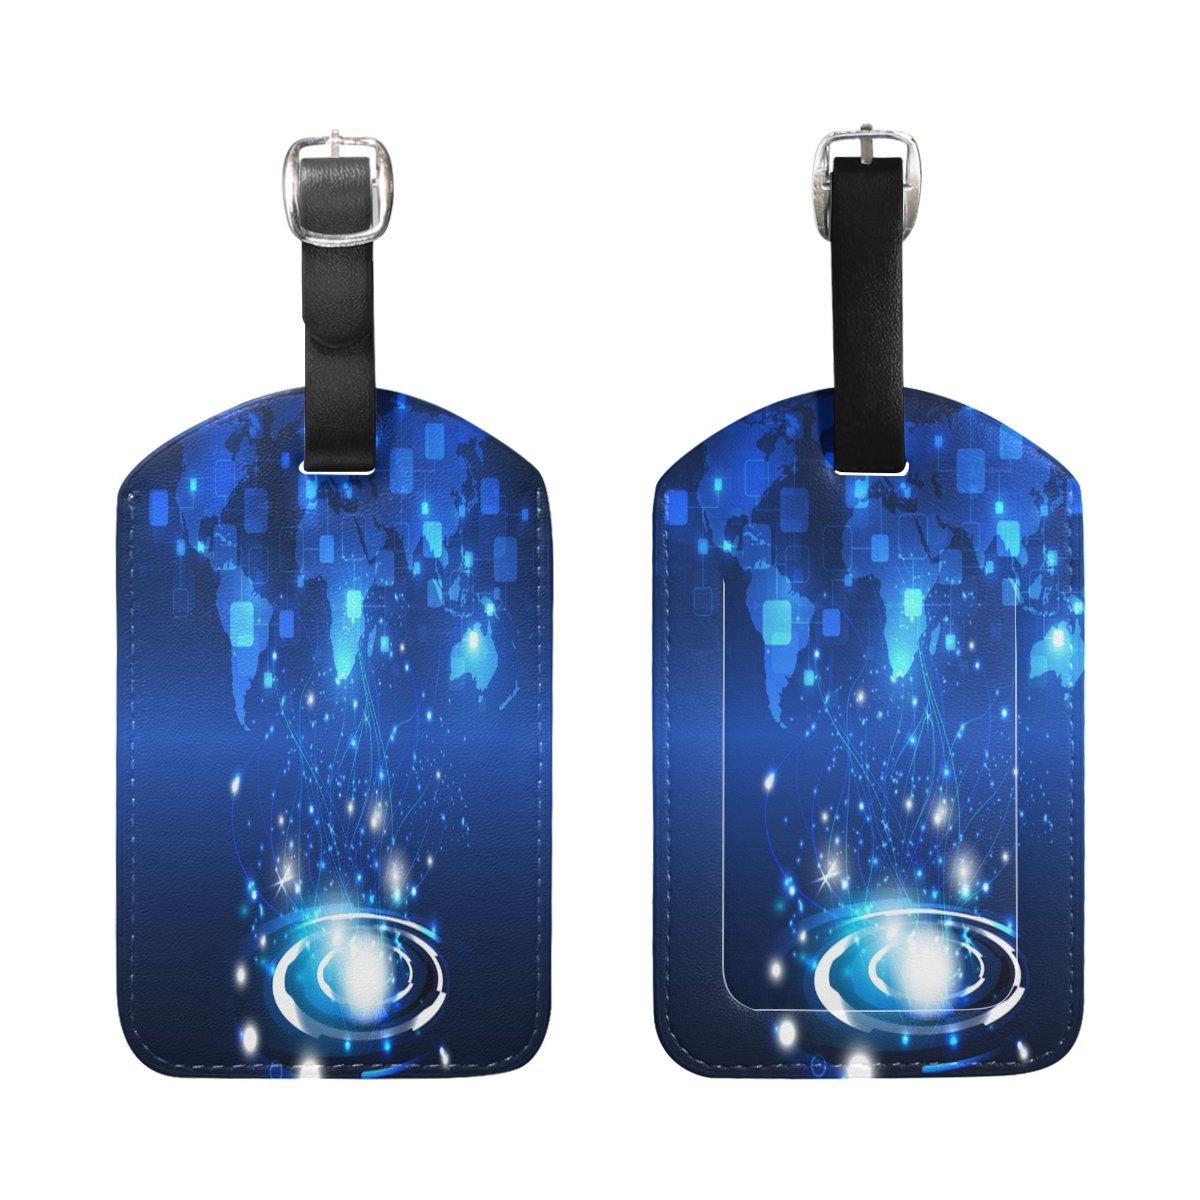 1Pcs Saobao Travel Luggage Tag Mandala On Dark Blue Background PU Leather Baggage Suitcase Travel ID Bag Tag